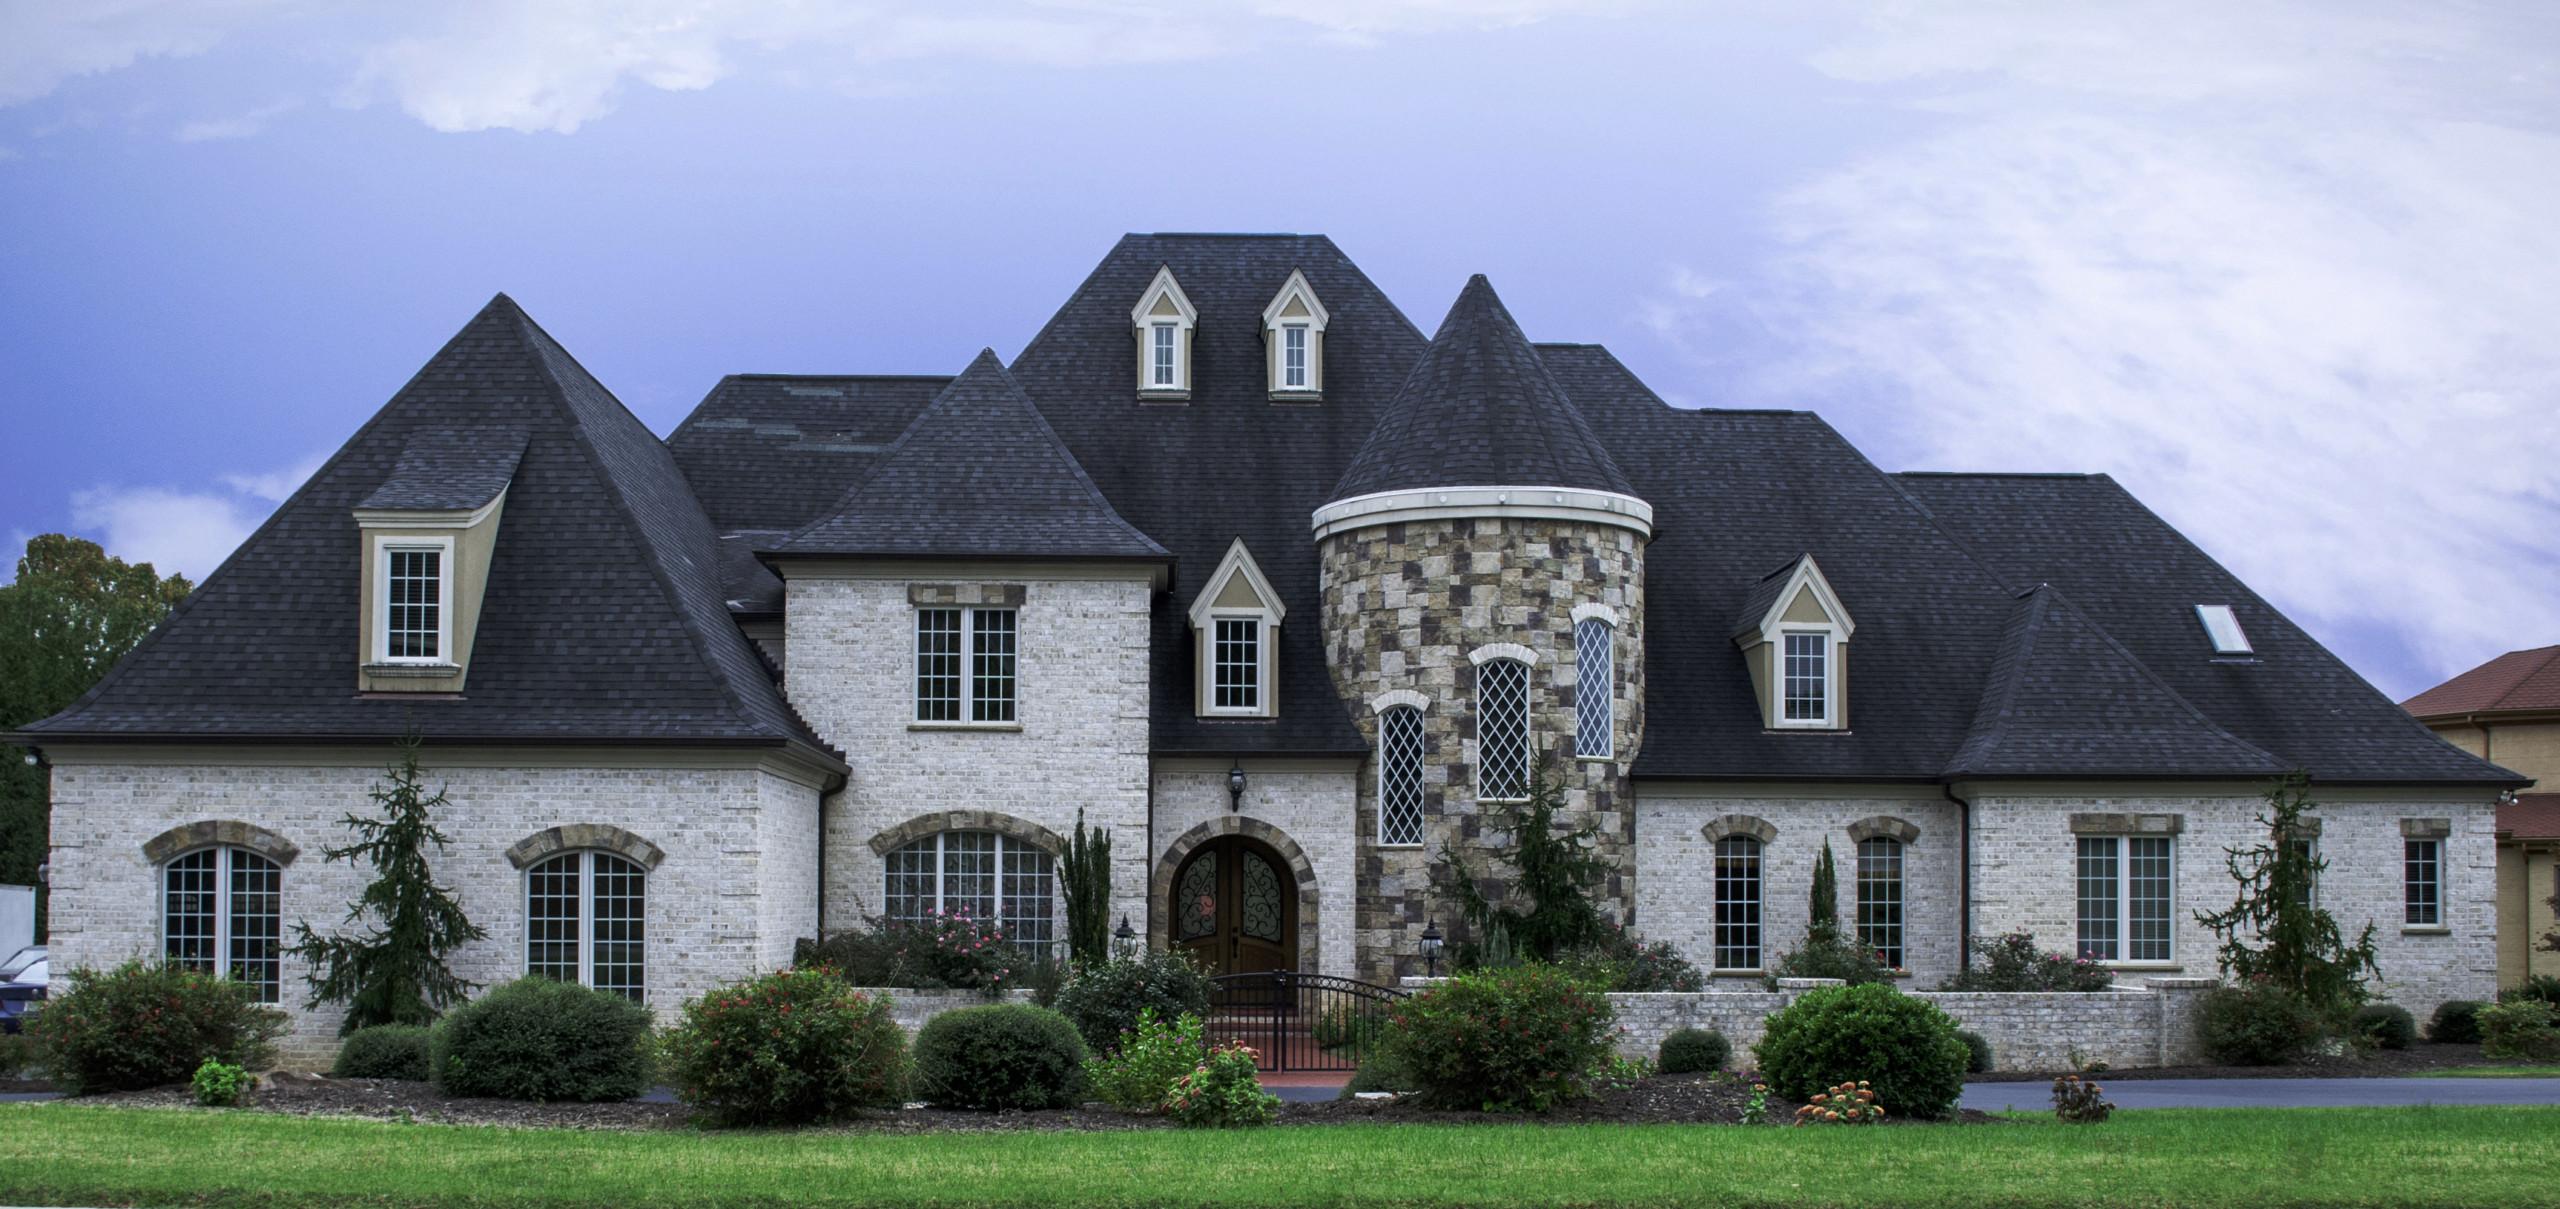 Chesapeake Pearl - White Mortar - Stone